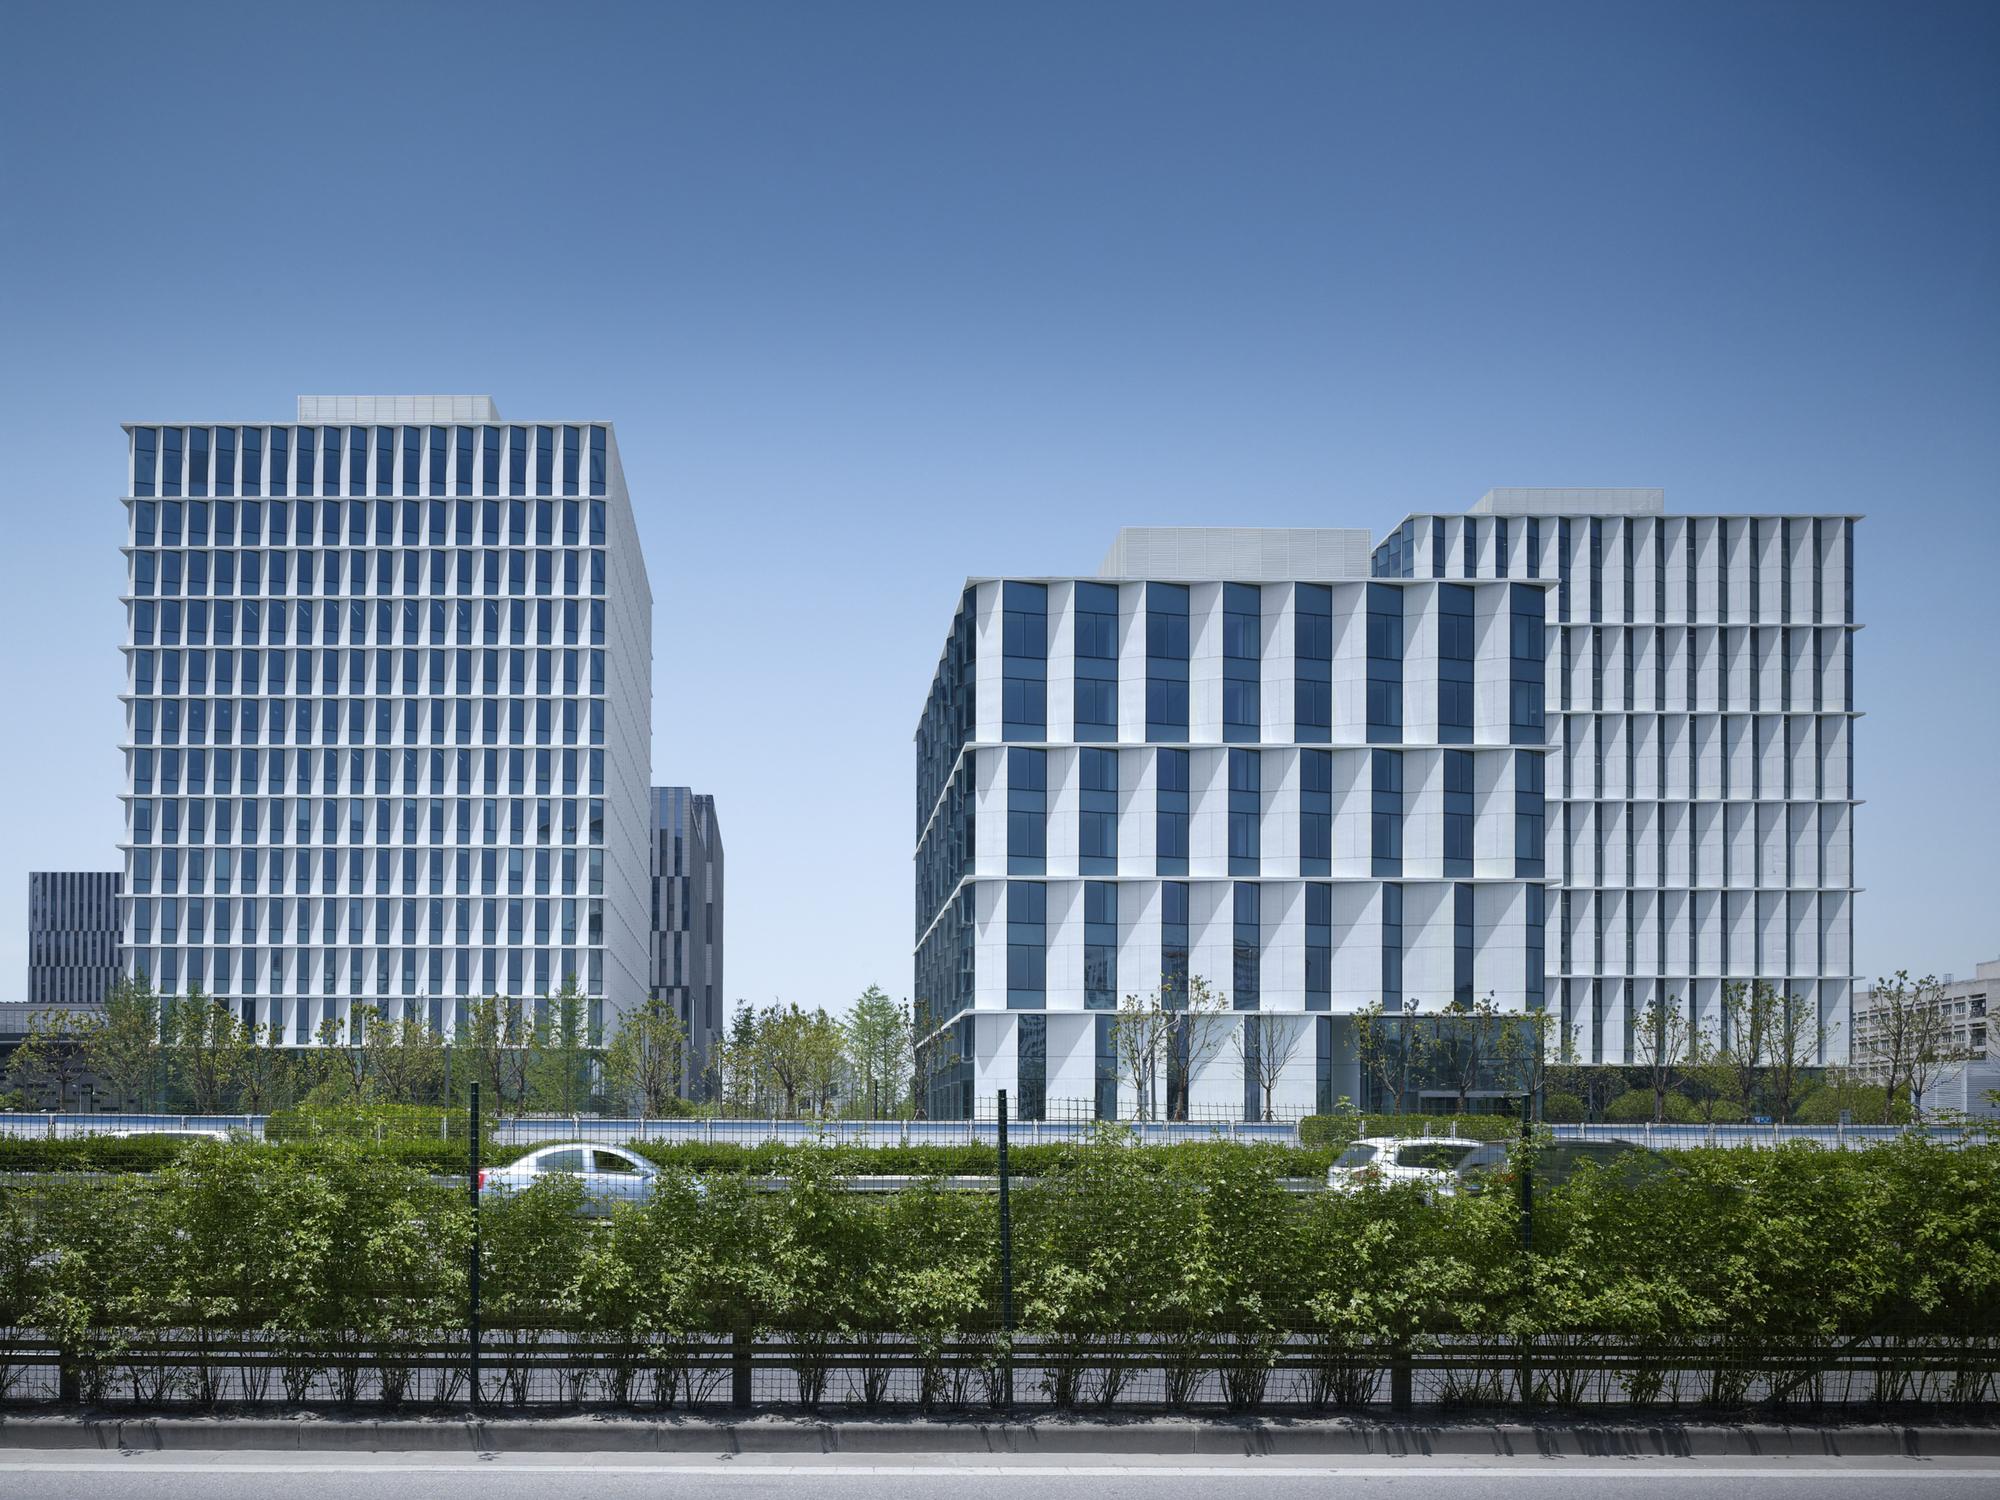 Gallery of 3cubes office building gmp architekten 9 - Gmp architektur ...